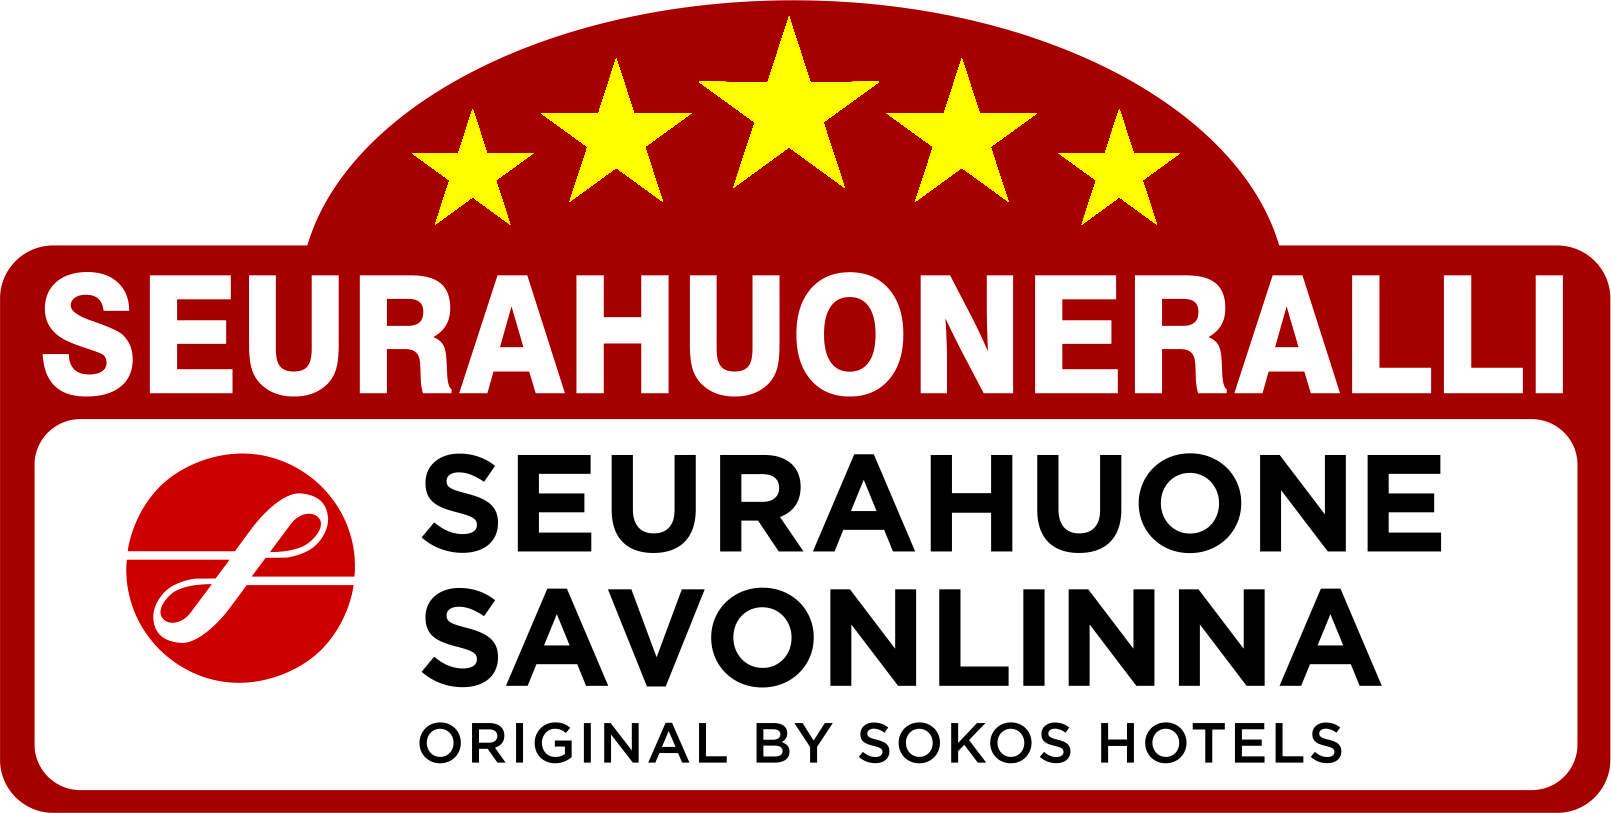 Seurahuoneralli_logo_2017